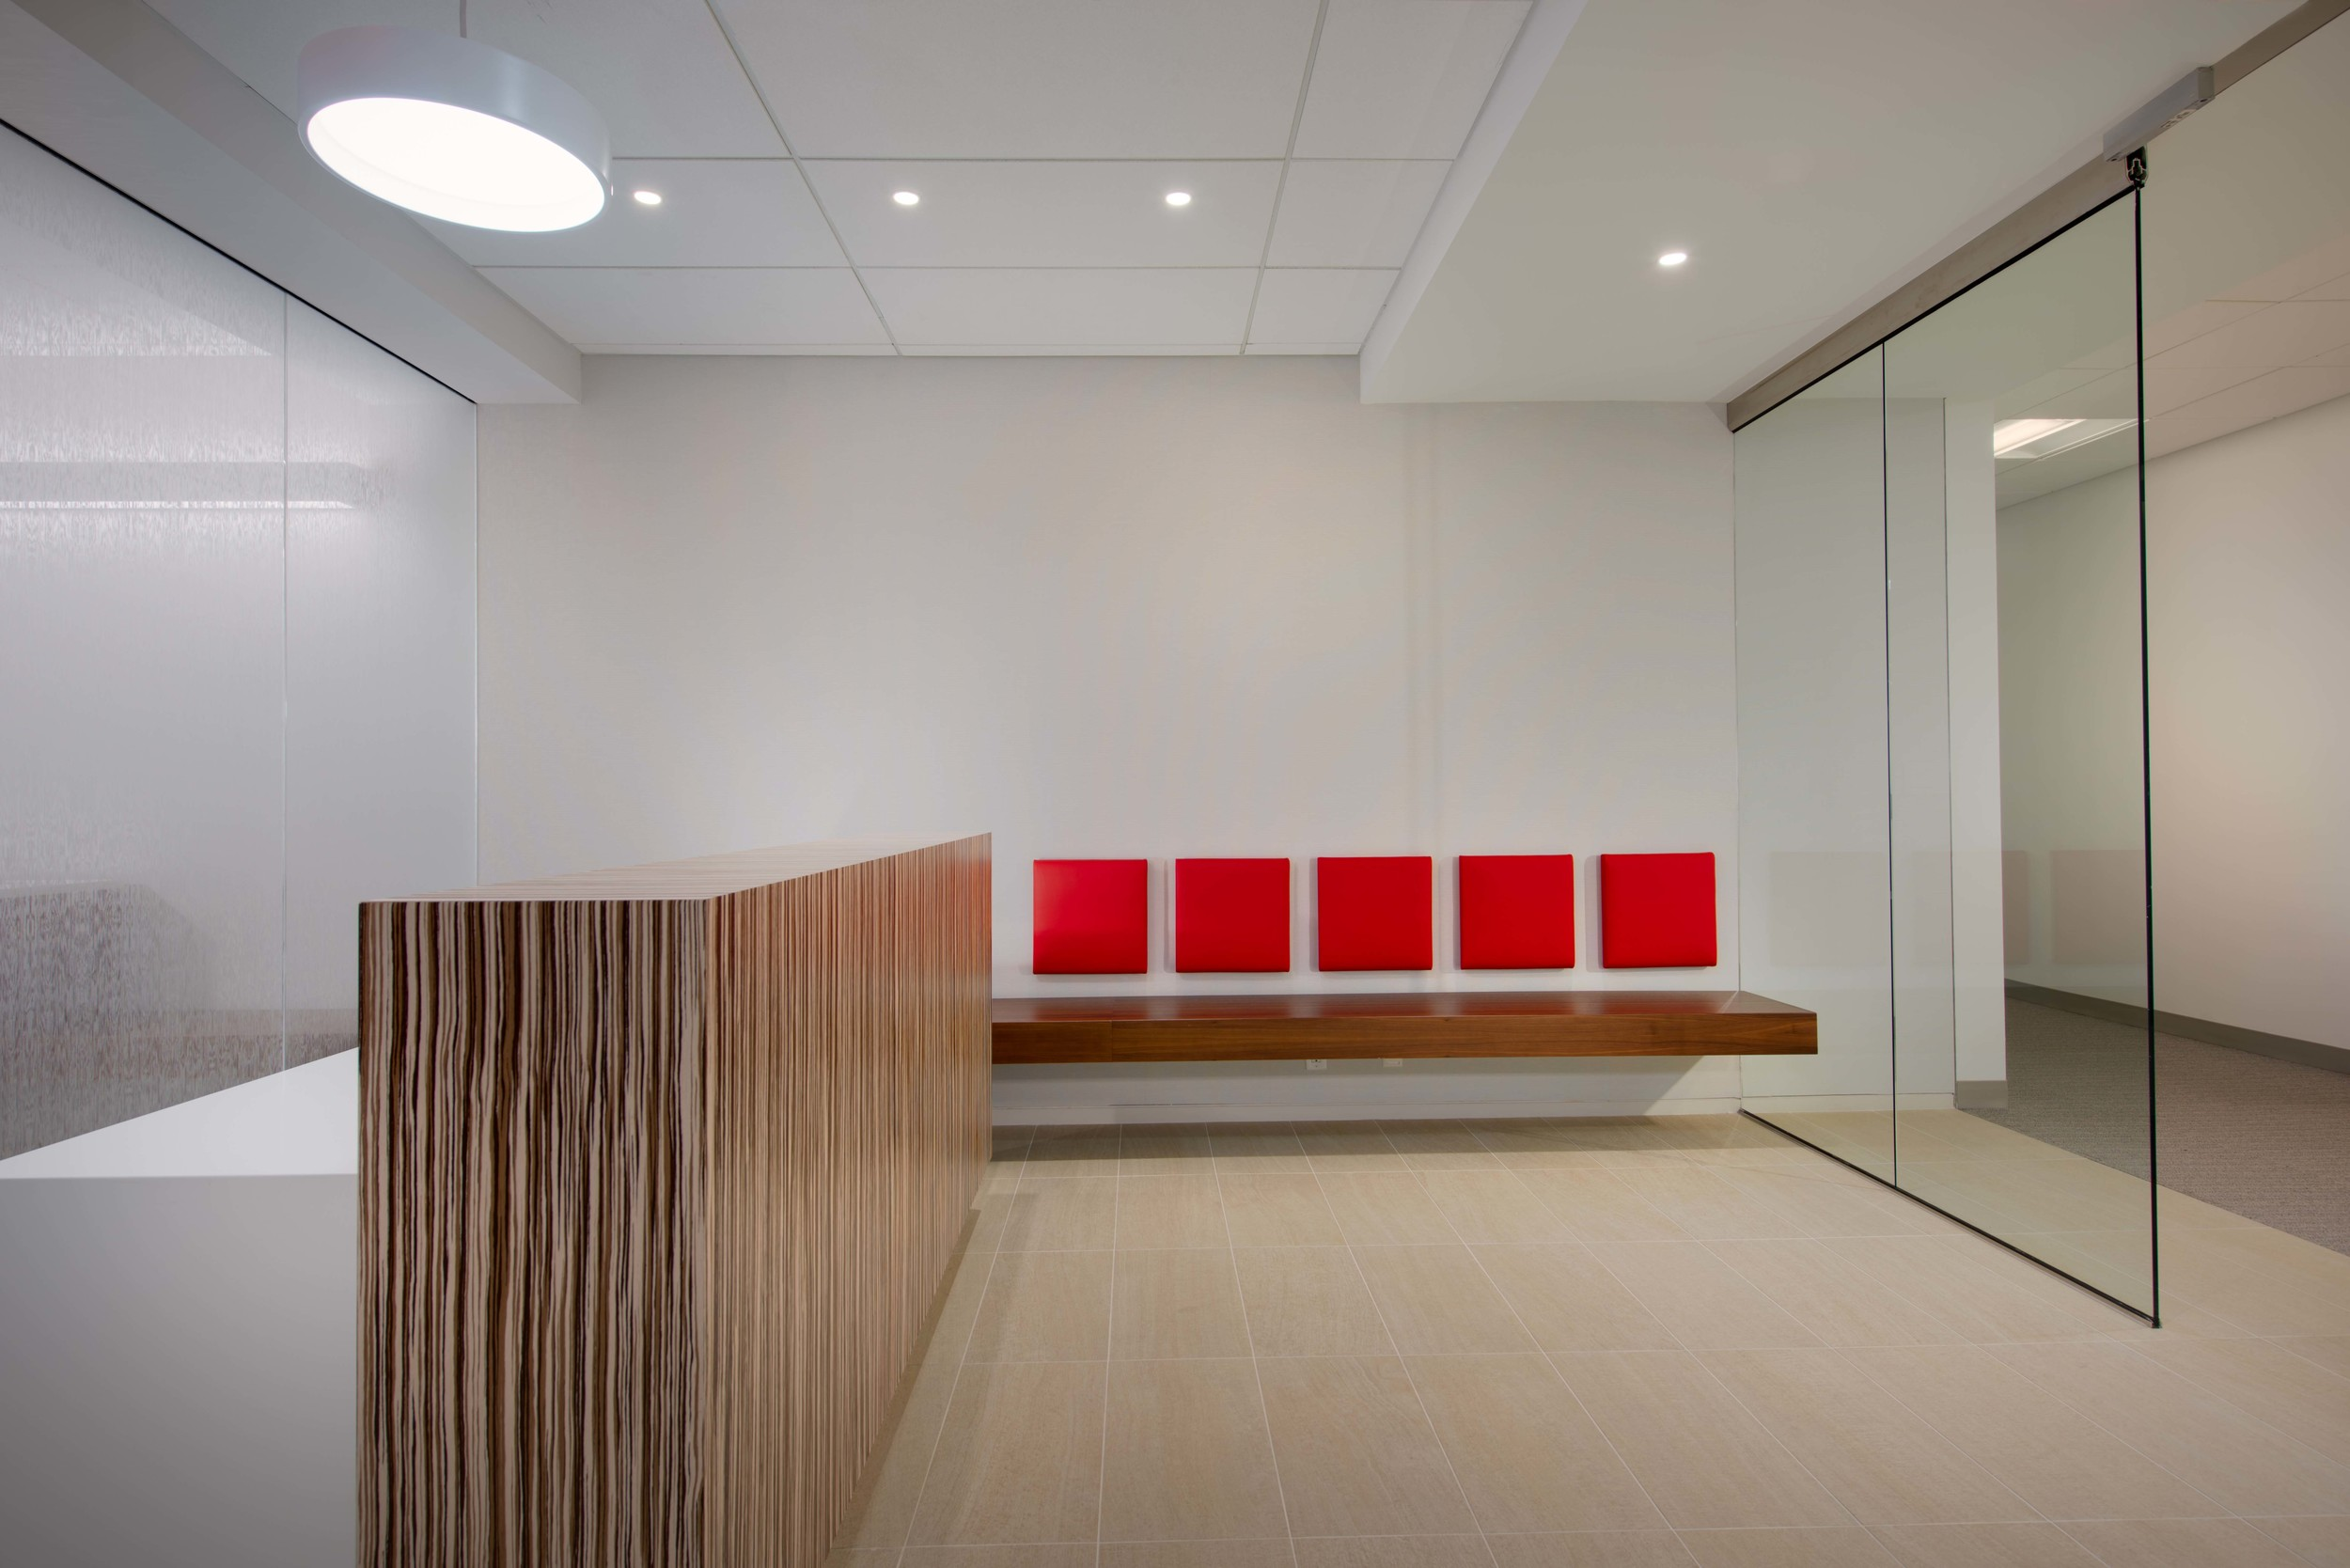 1200 17th Office Suite Interior Image 216479.jpg